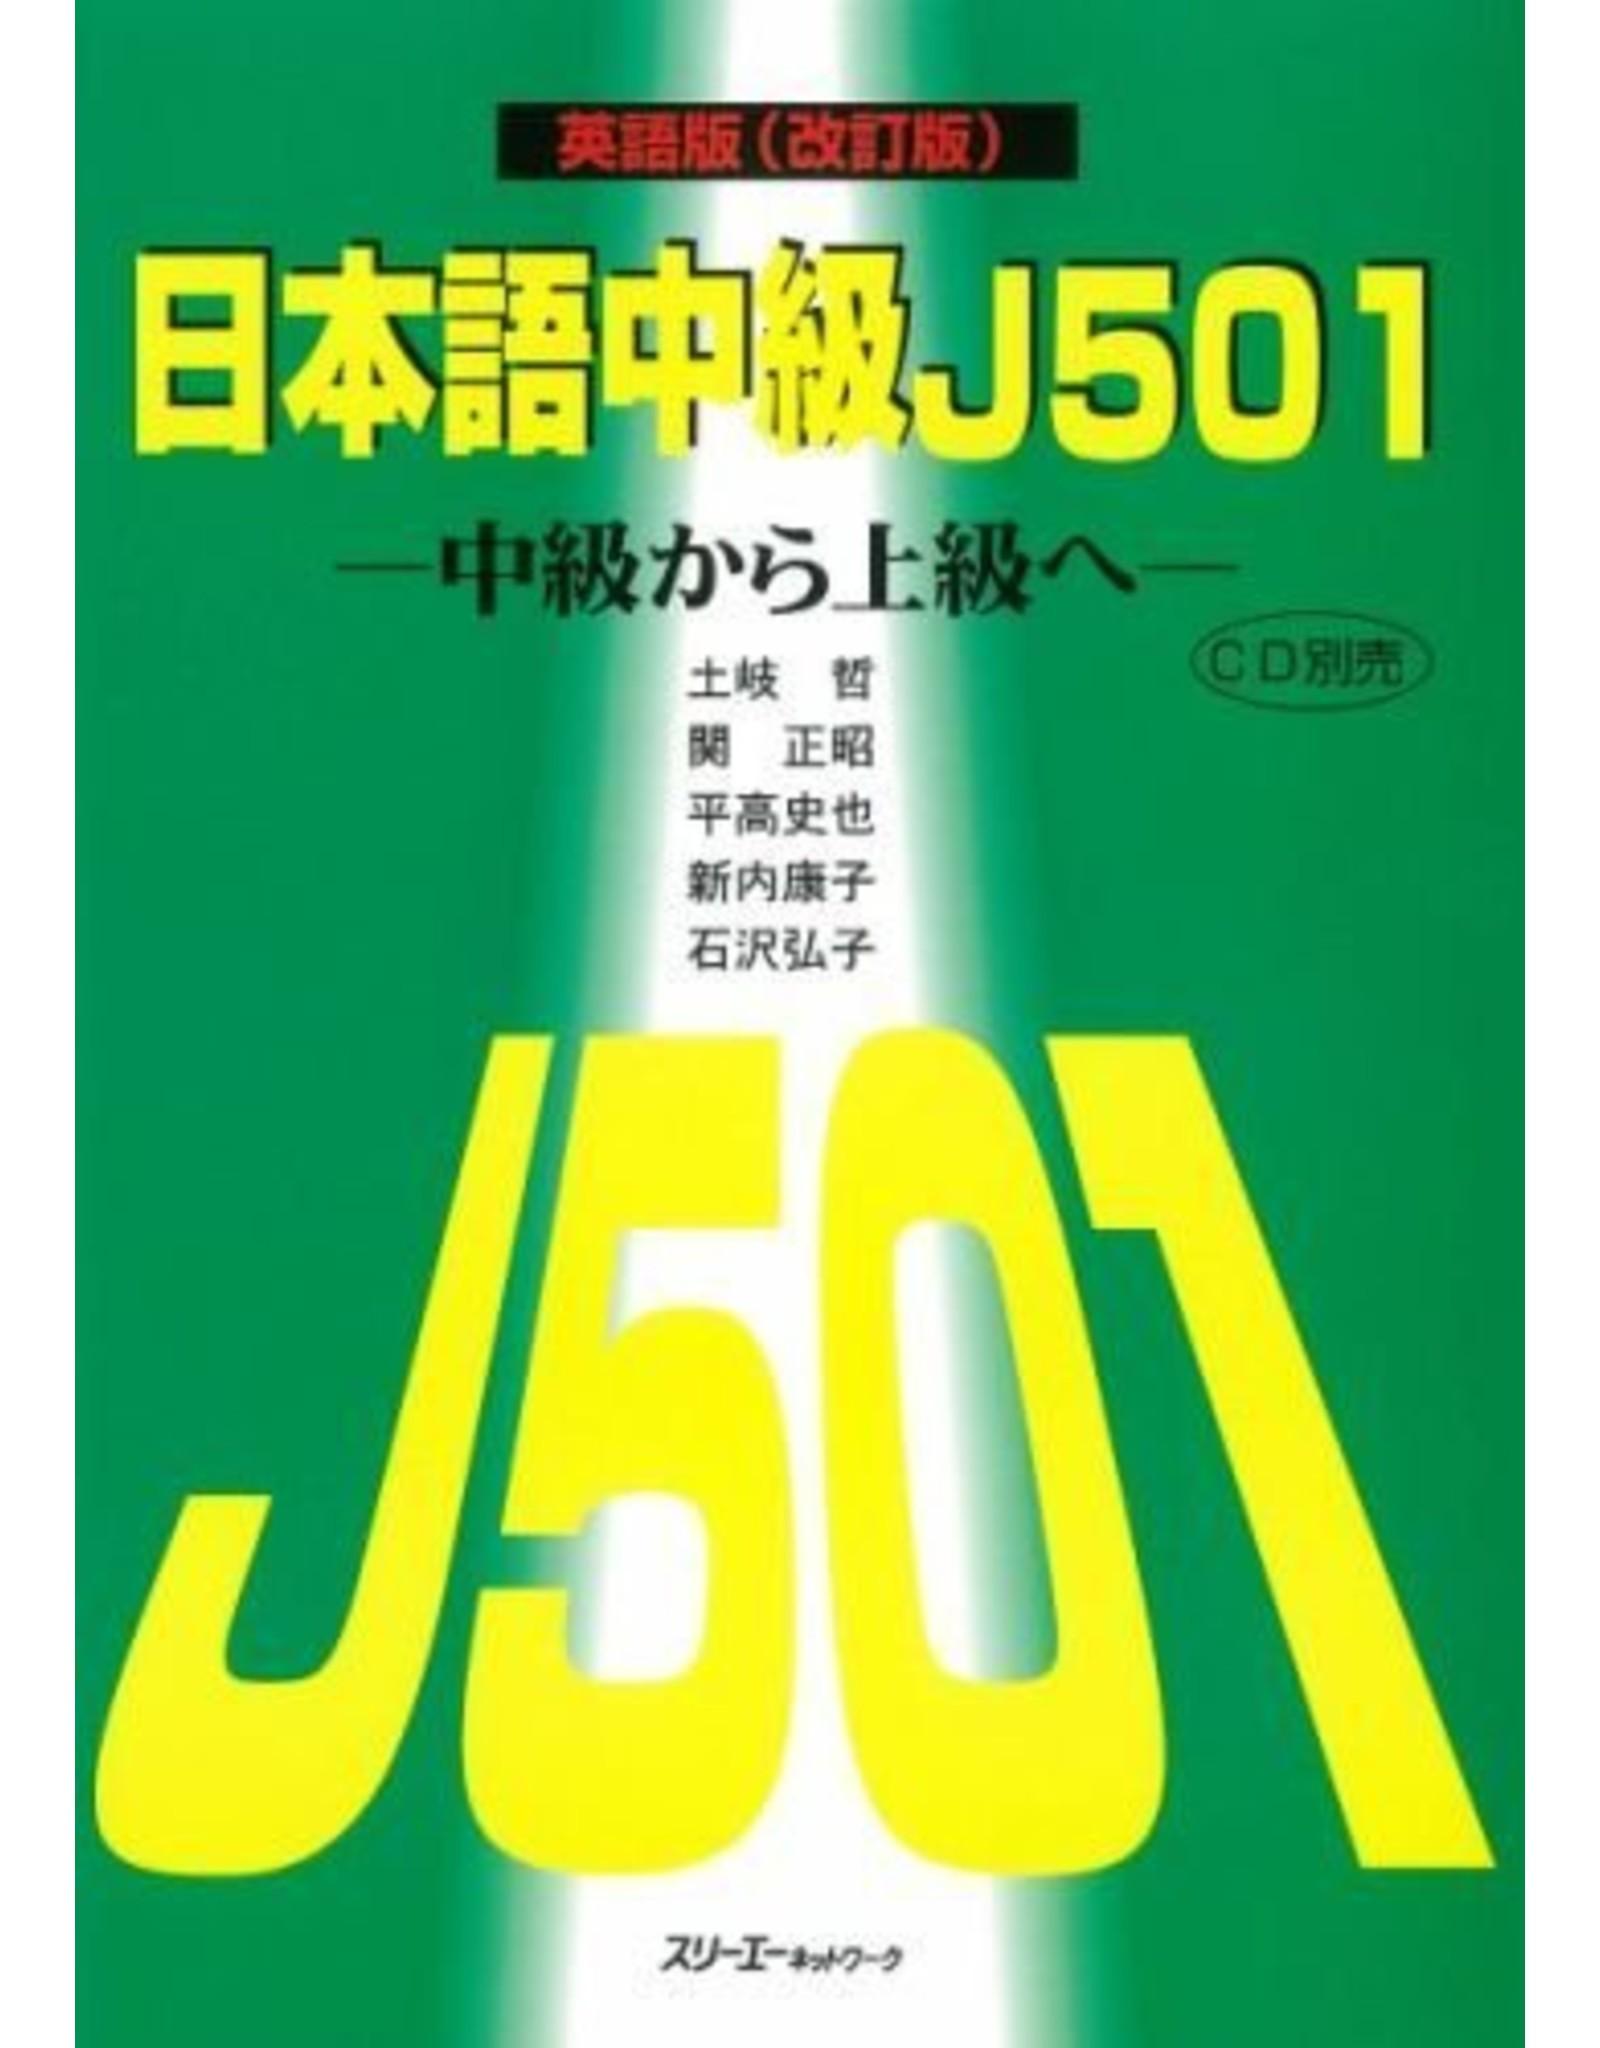 3A Corporation NIHONGO CHUKYU J501/TEXTBOOK (REVISED)